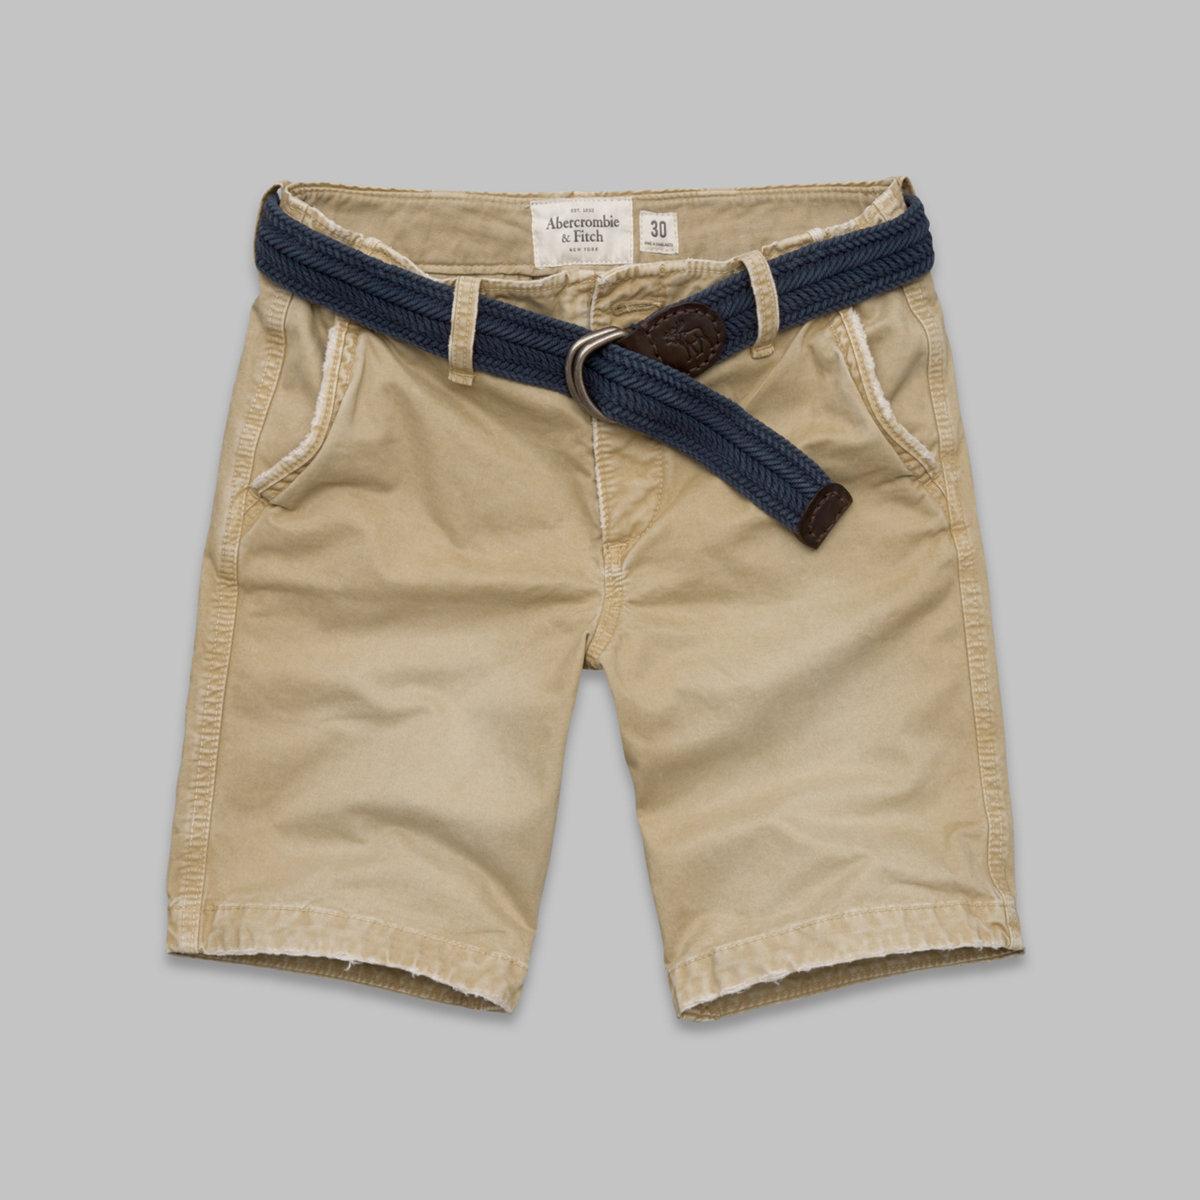 A&F Classic Fit Shorts